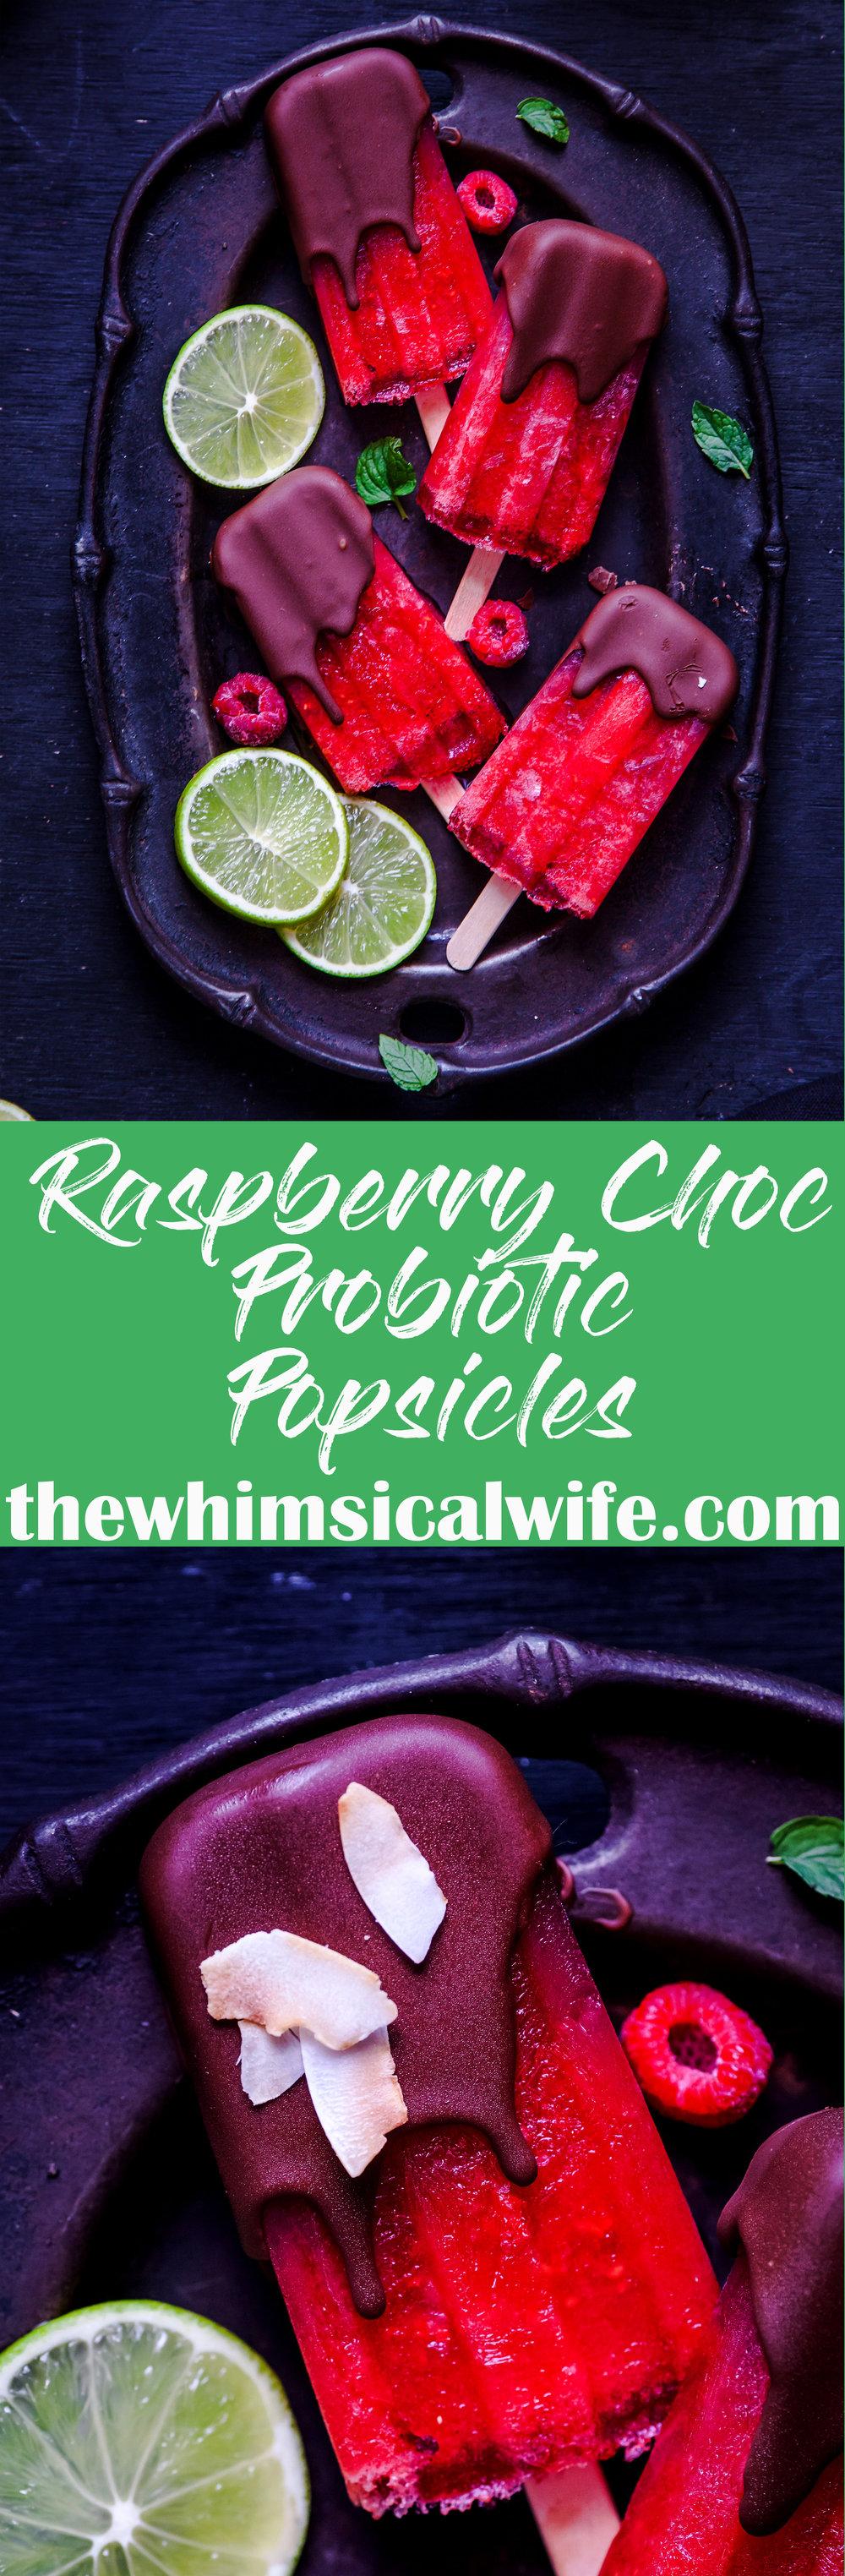 Sneaky Raspberry Choc Probiotic Popsicles {Dairy, Gluten, Nut & Egg Free}